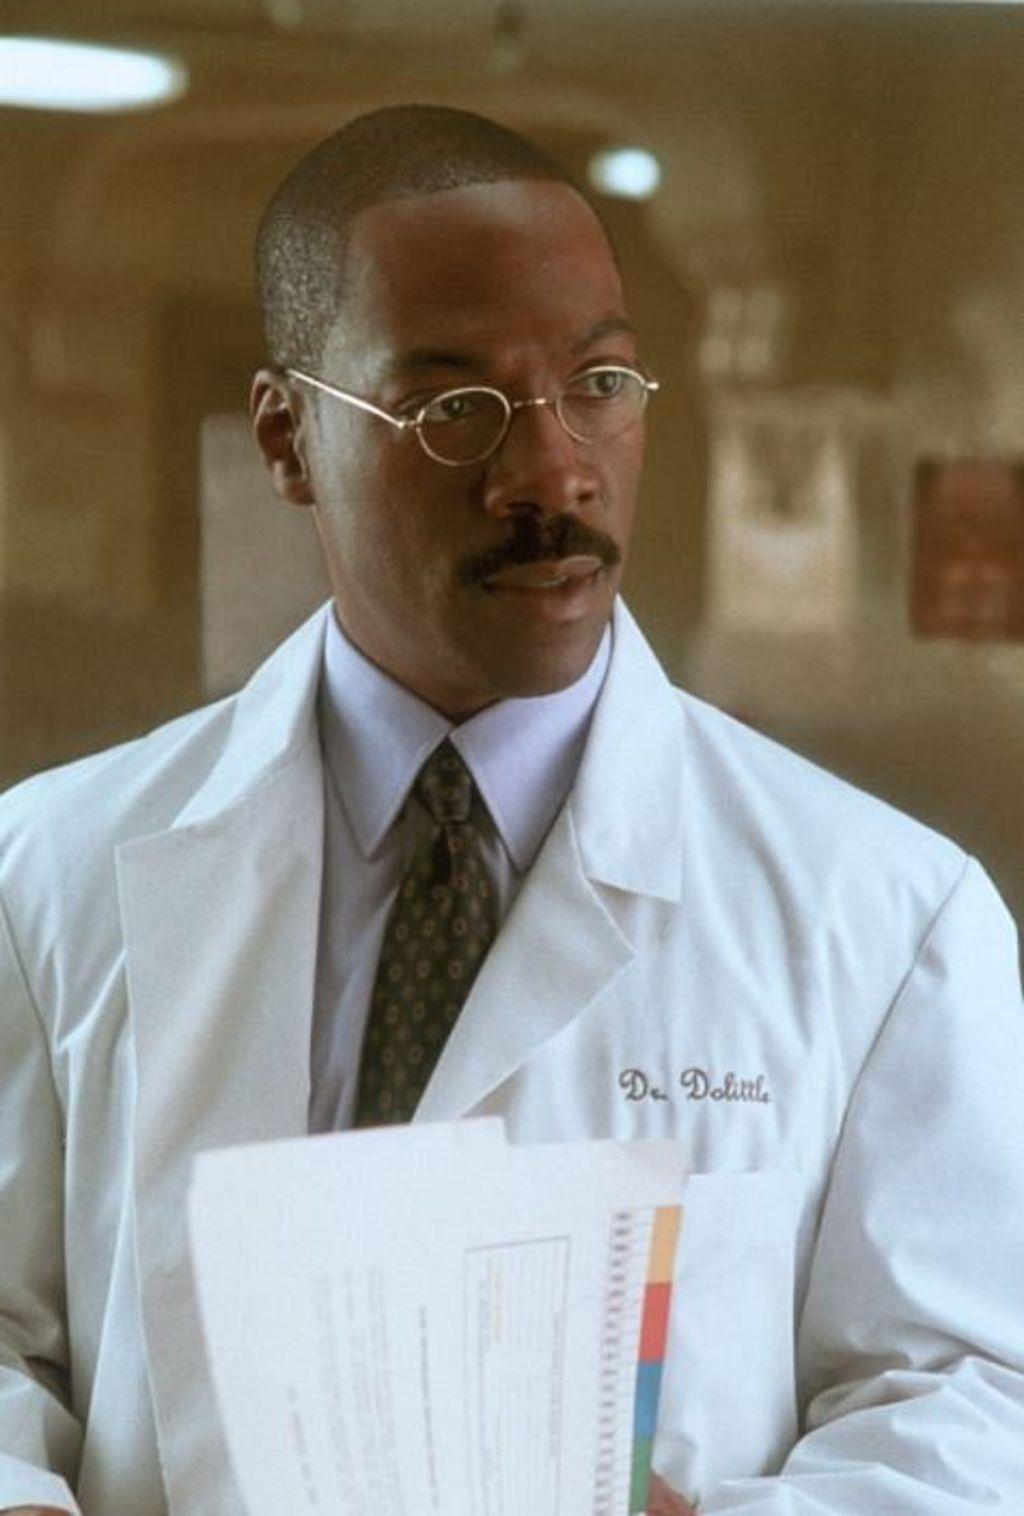 Watch Dr Dolittle 2 On Netflix Today Netflixmovies Com